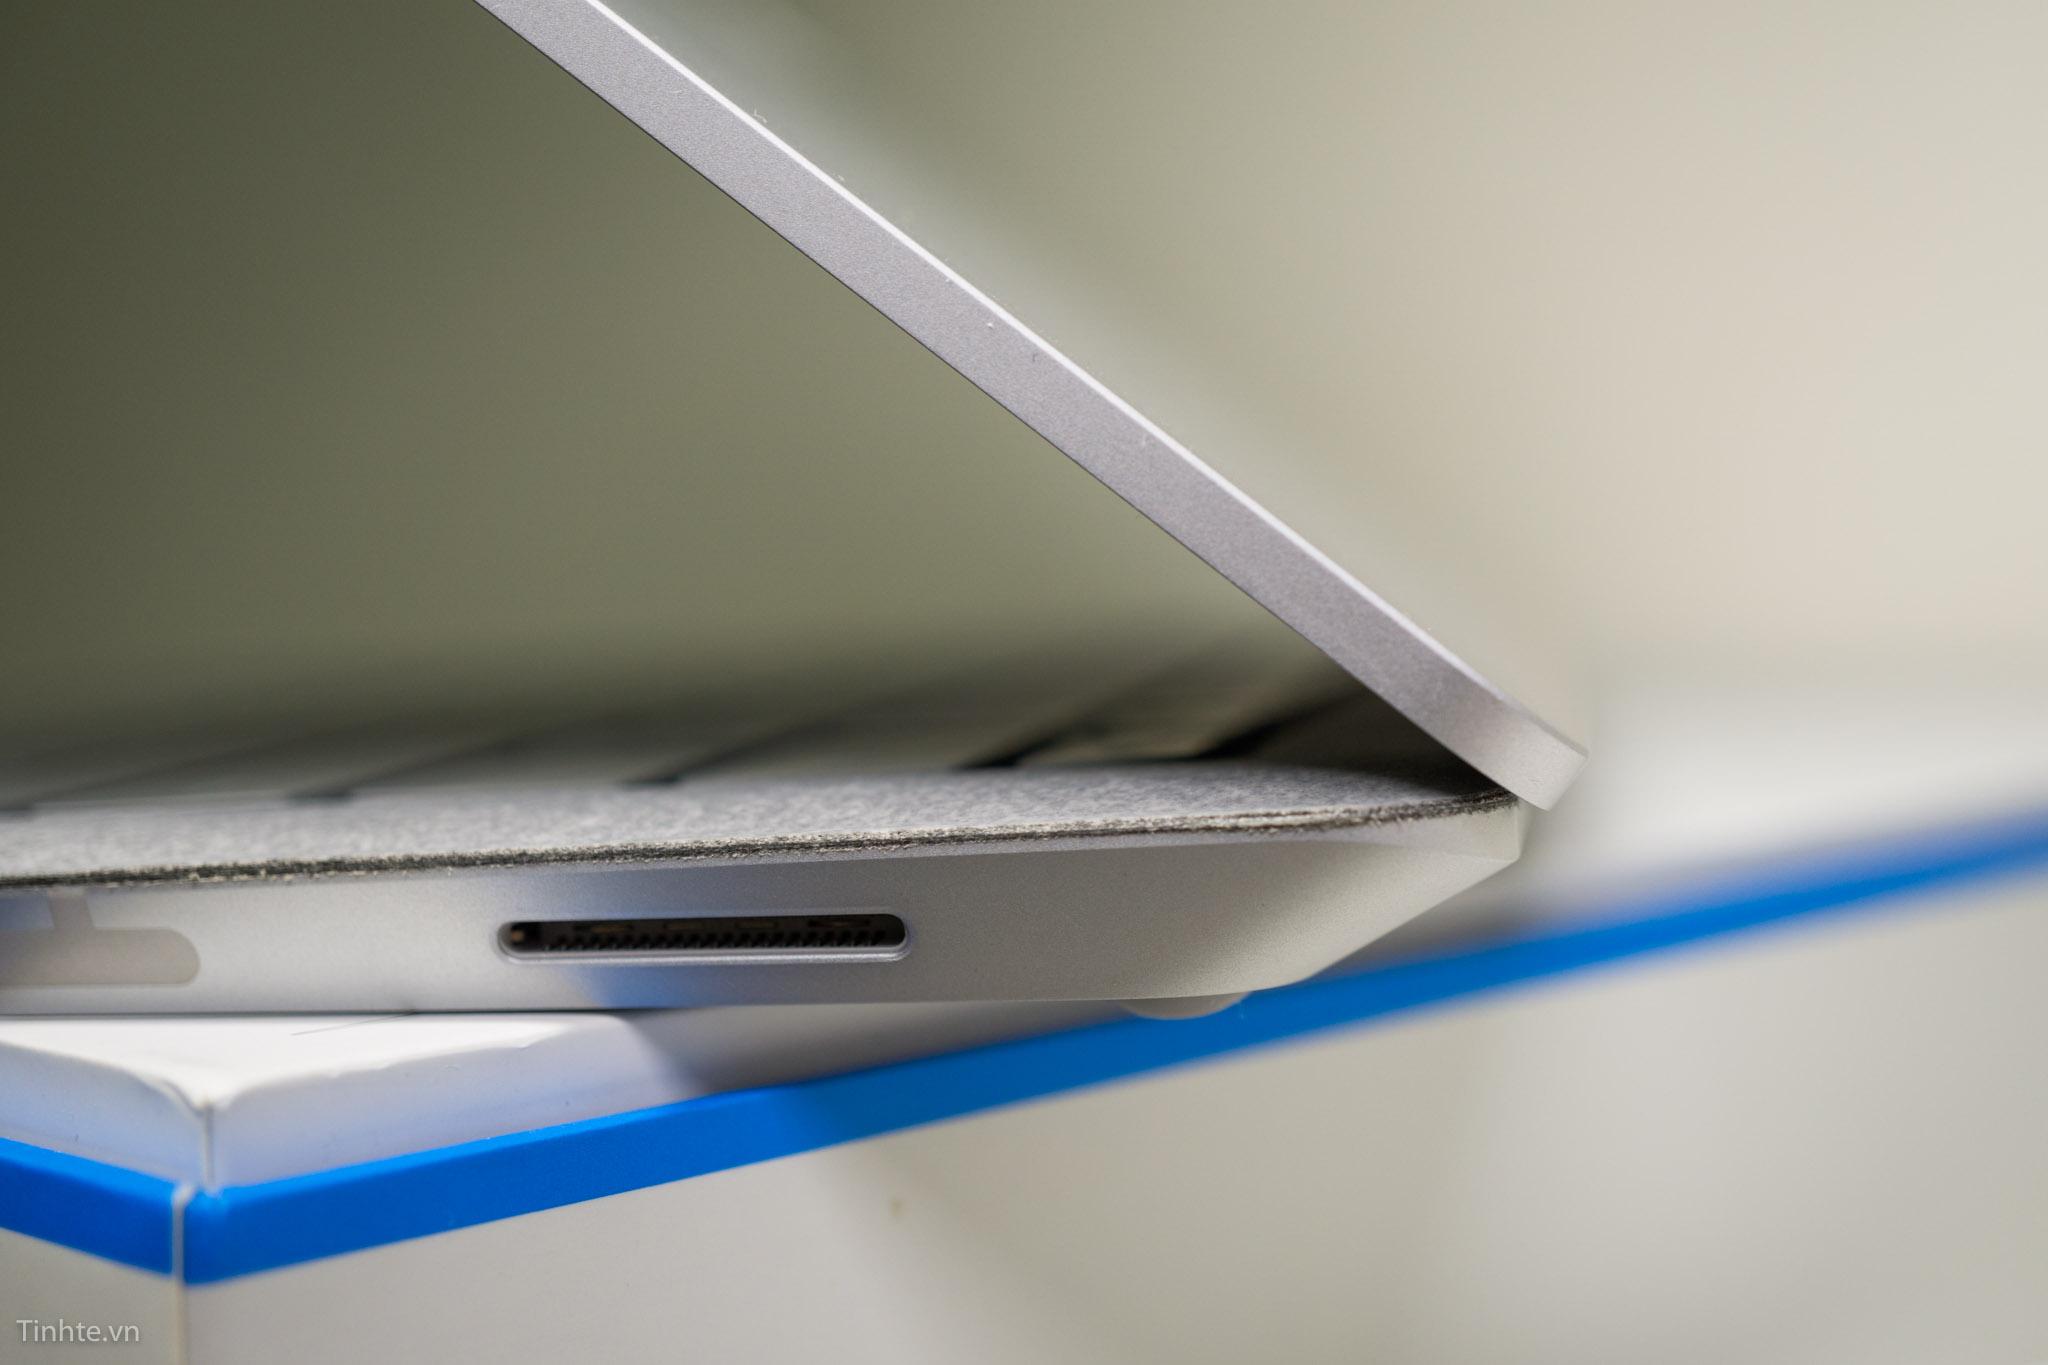 surface_laptop_tinhte-16.jpg